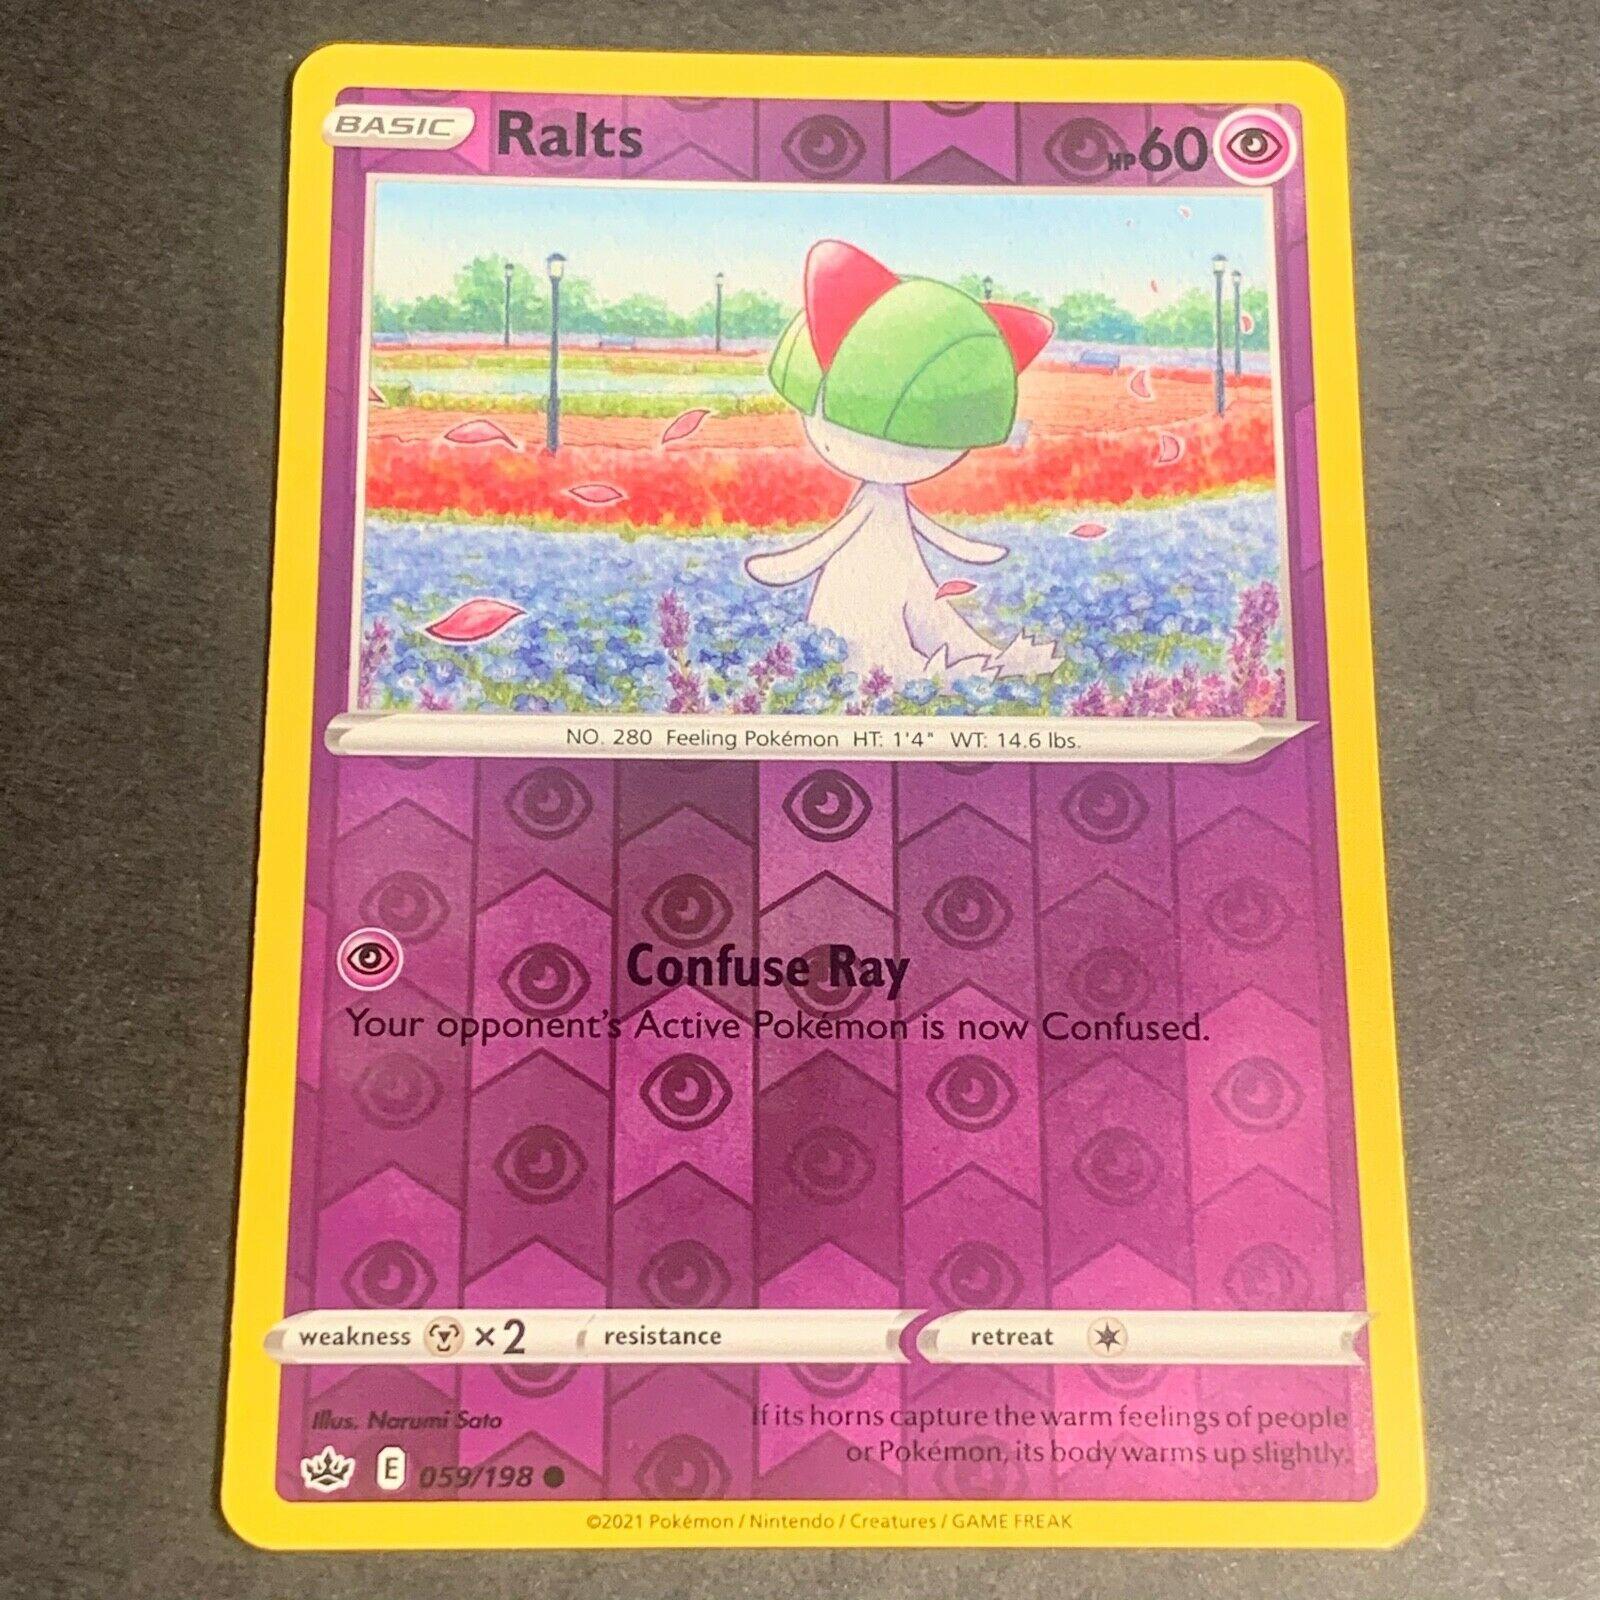 Pokemon S&S Chilling Reign Set REVERSE HOLO (C.) Ralts 059/198 - Near Mint (NM)